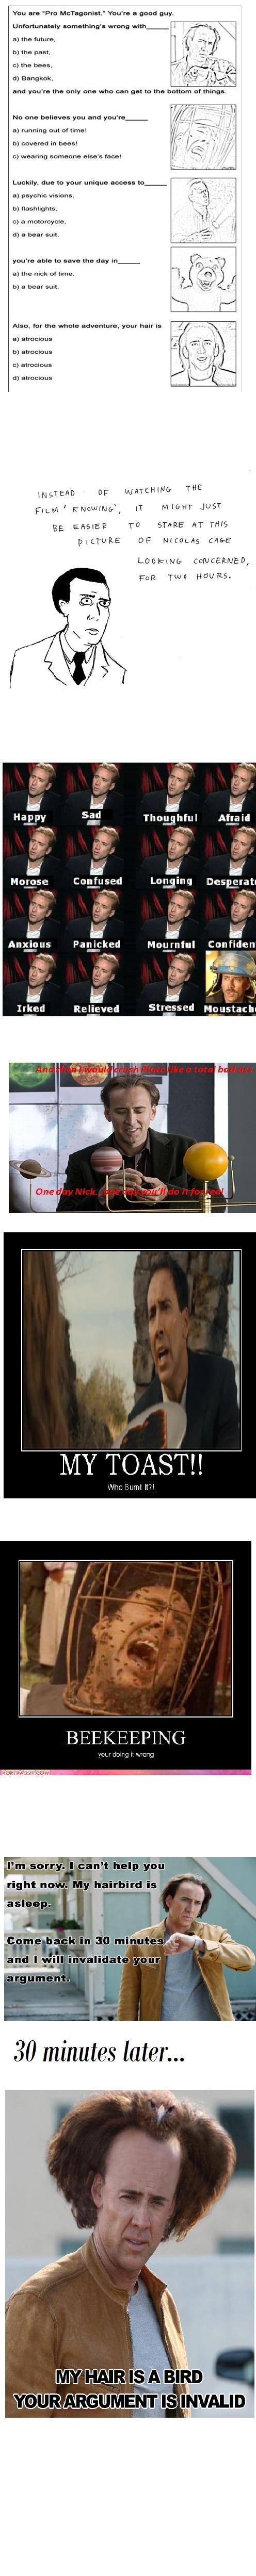 "Nicolas Cage My Hero. A dedication to my hero. Thumb is Nicolas Cage is also your hero. You are 'Pro ."" You' re u one any. omu. mo-- varona with n m. tuturu my  nicolas cage hero lol"